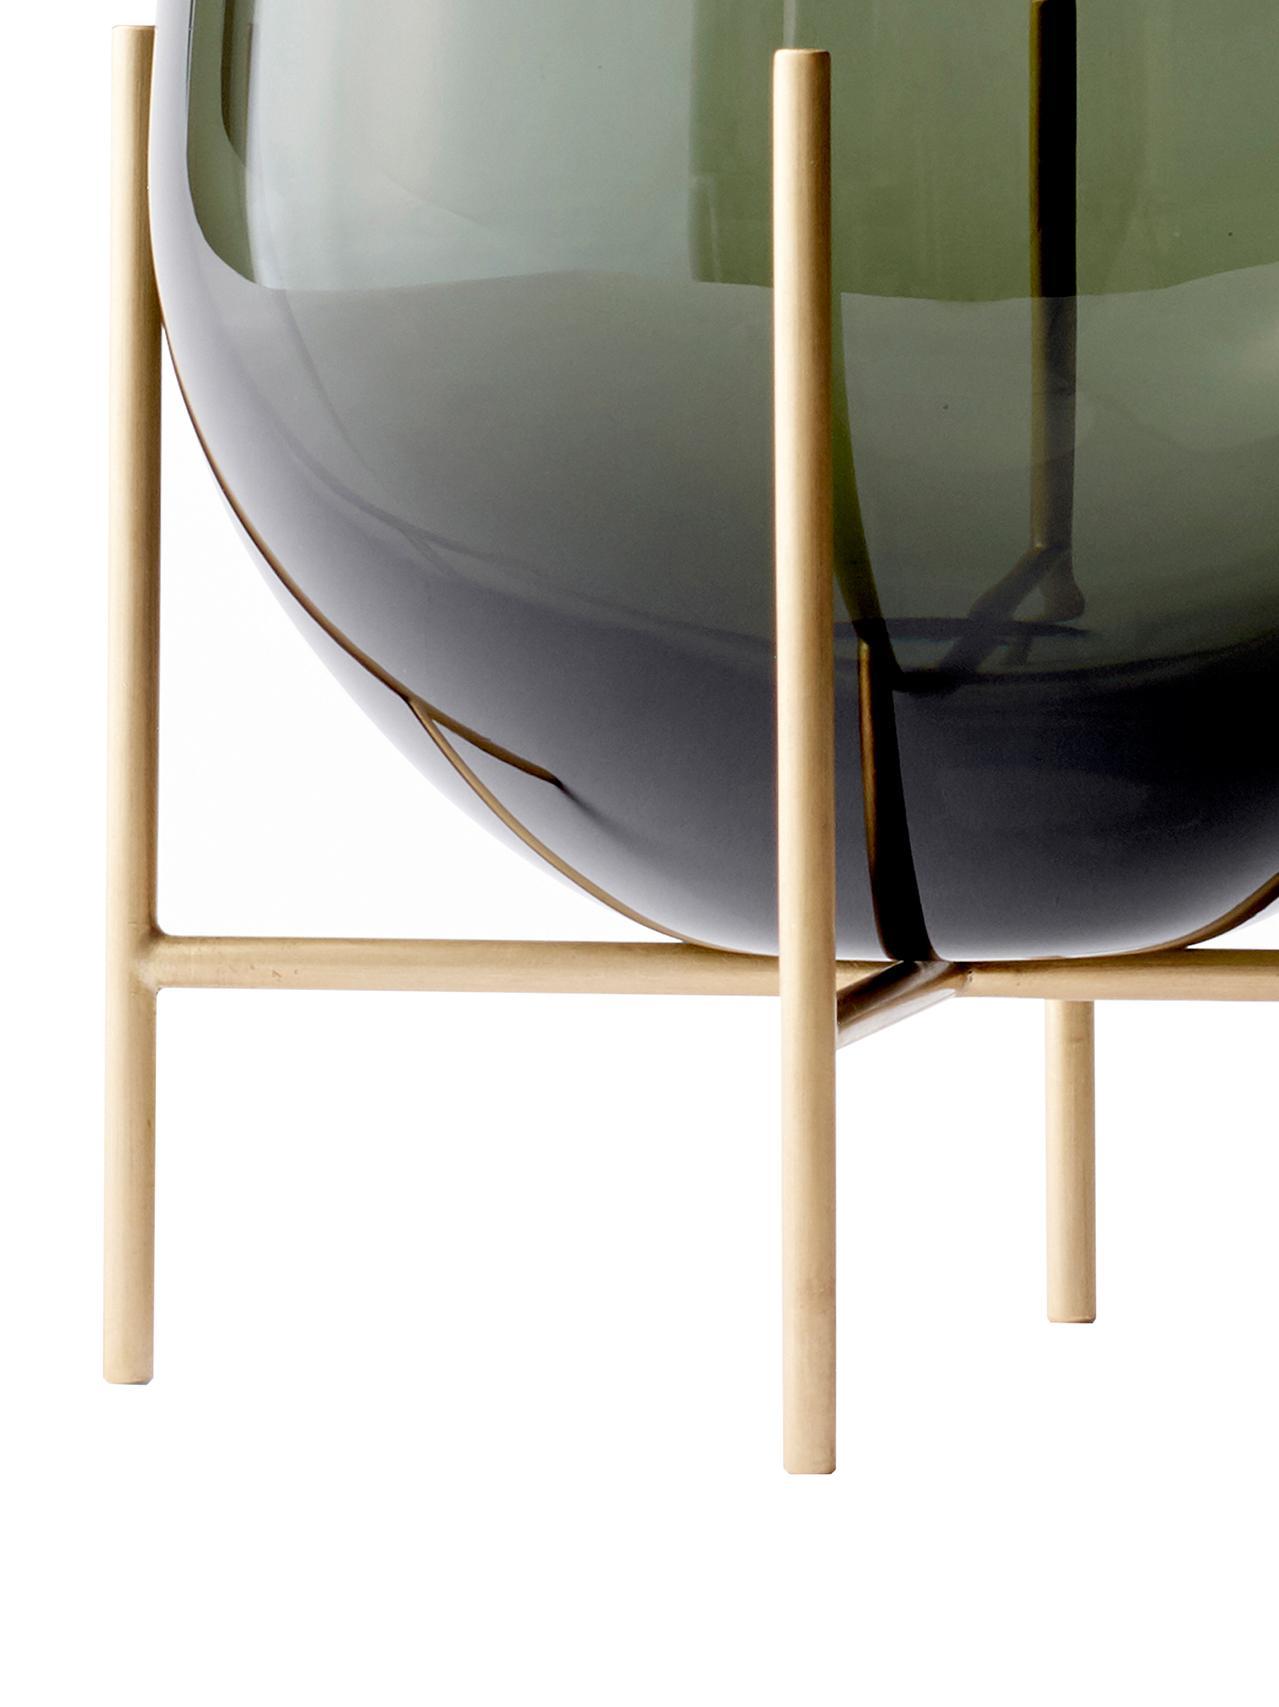 Vaso di design Échasse, Struttura: ottone, Vaso: vetro soffiato, Ottone, Ø 15 x Alt. 45 cm